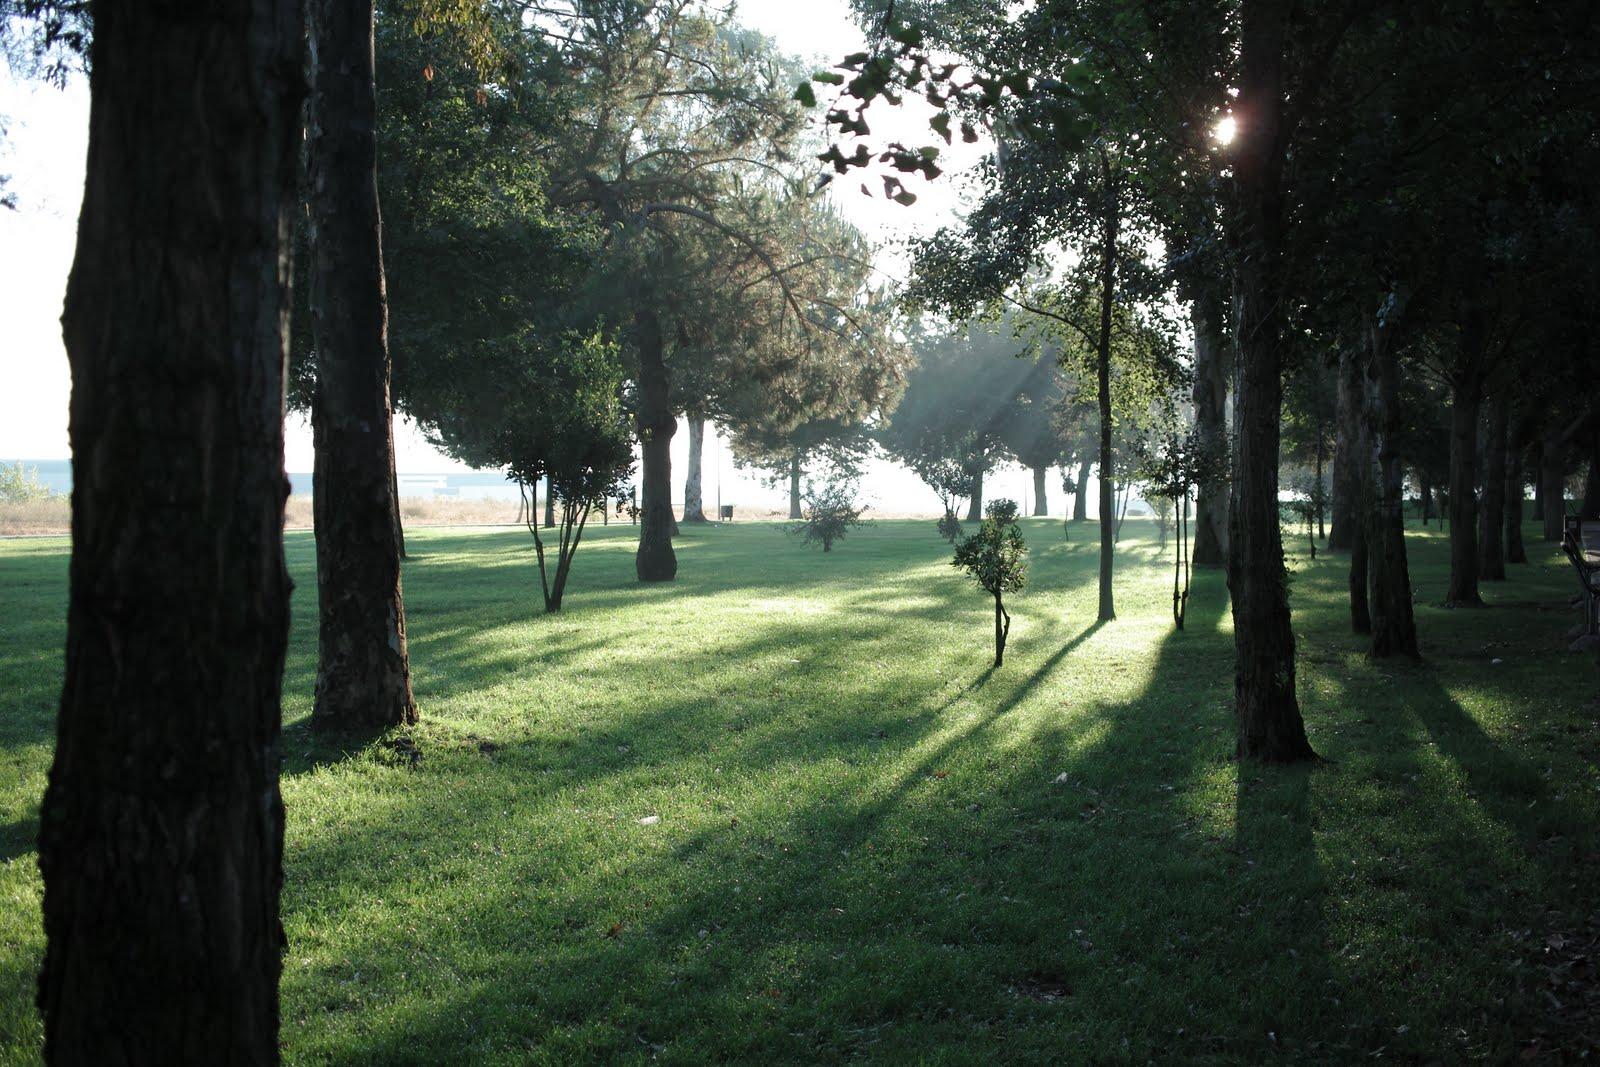 sunday morning walk in the park